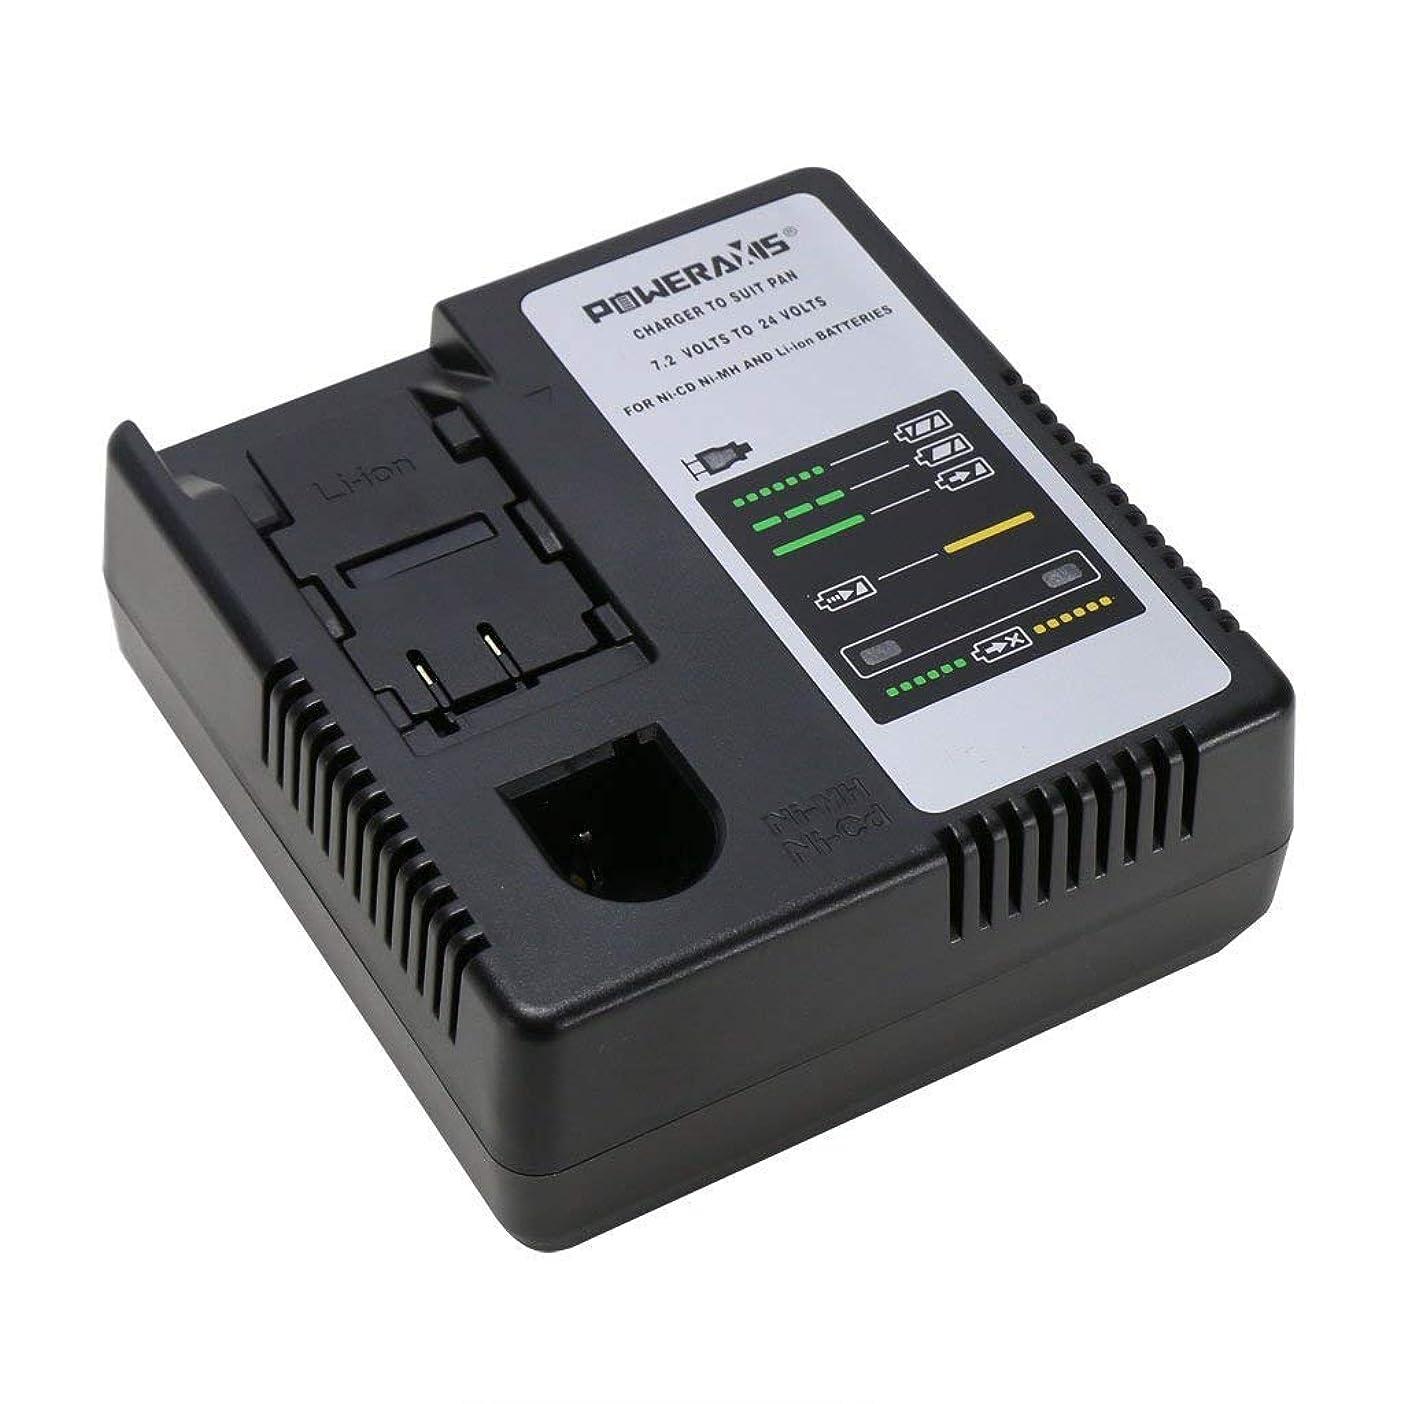 【 POWERAXIS 】【改良版】パナソニック Panasonic 7.2V~24V Ni-CD Ni-MH Li-ion 充電器 電動工具バッテリー 互換用 チャージャー